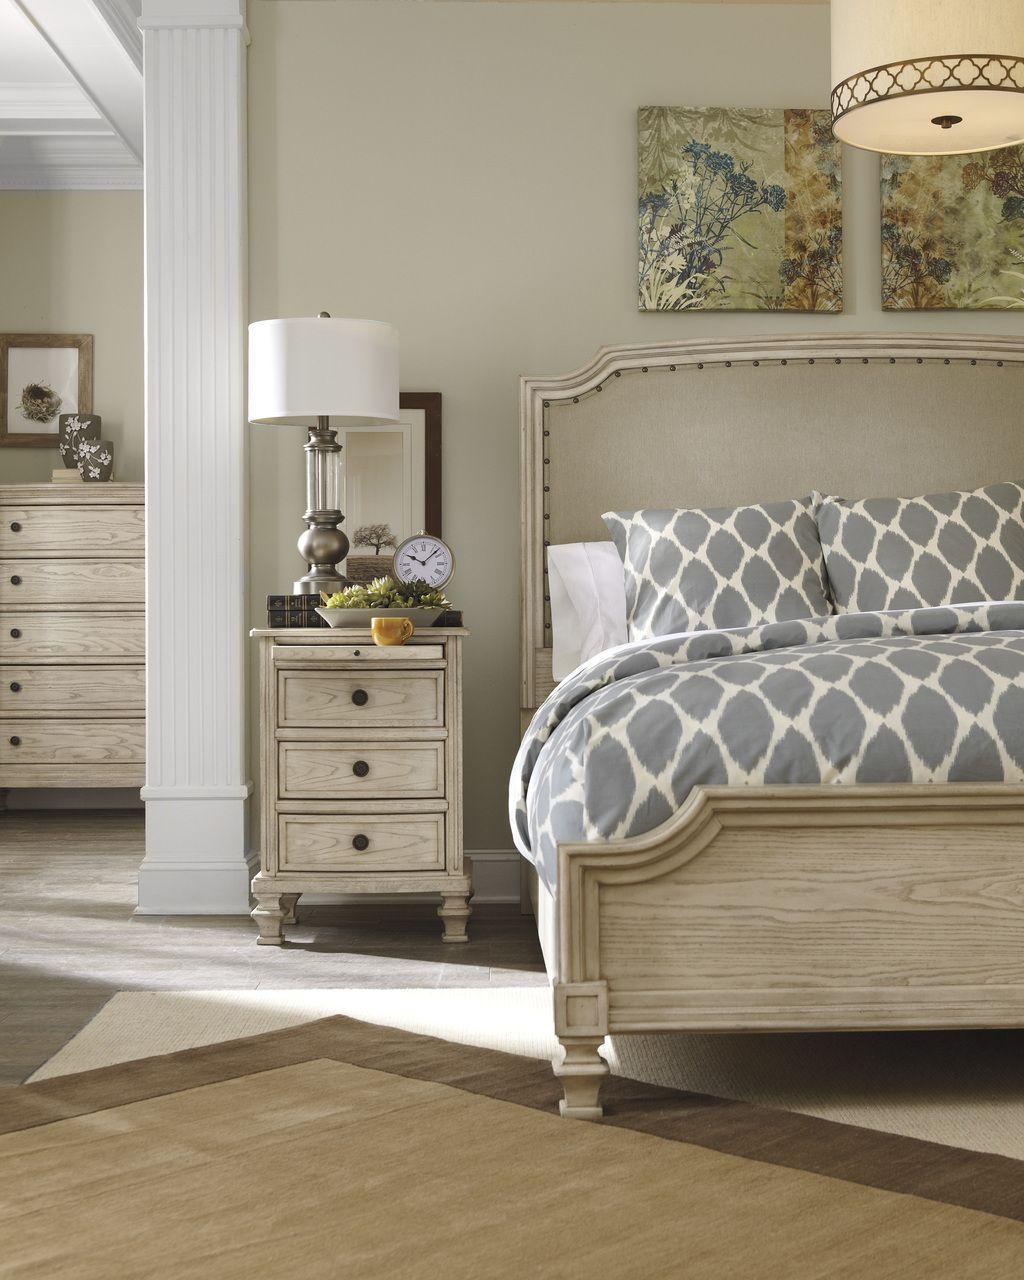 Ashley furniture demarlos king upholstered panel bed b693